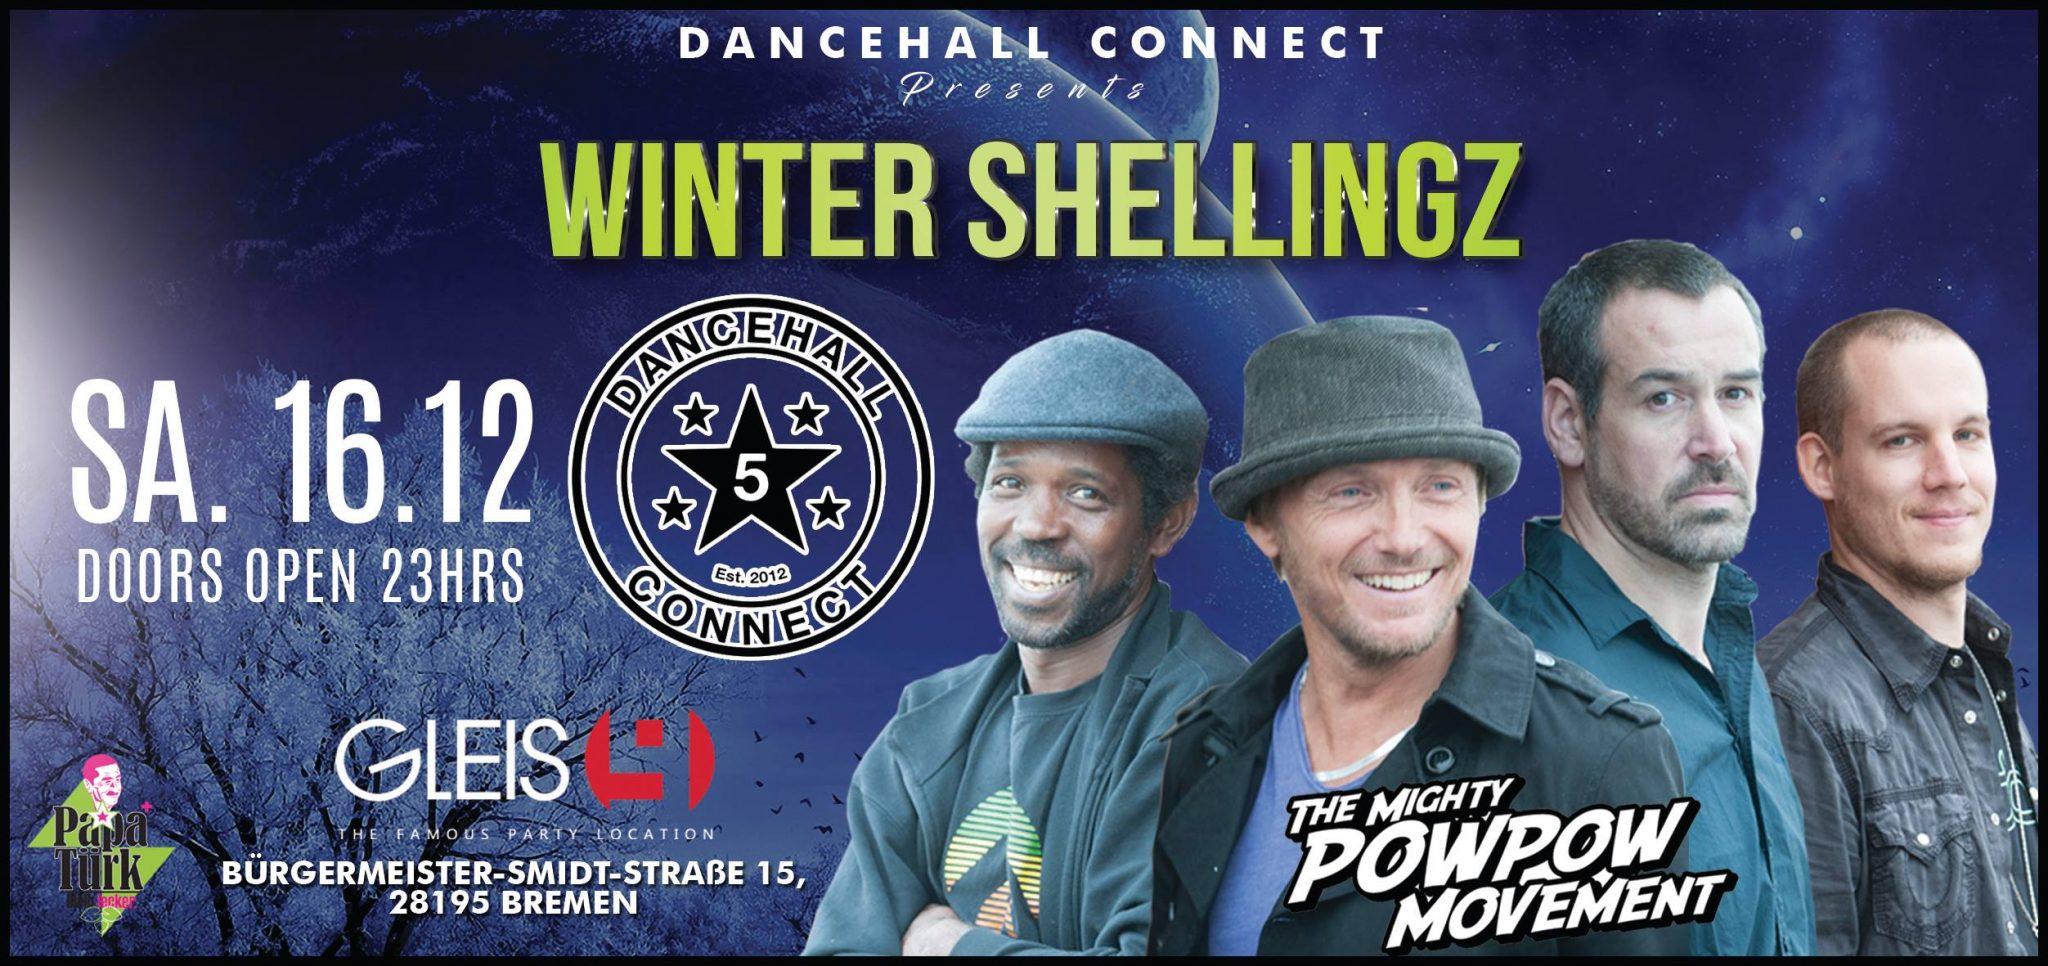 Winter Shellingz feat. Pow Pow Movement